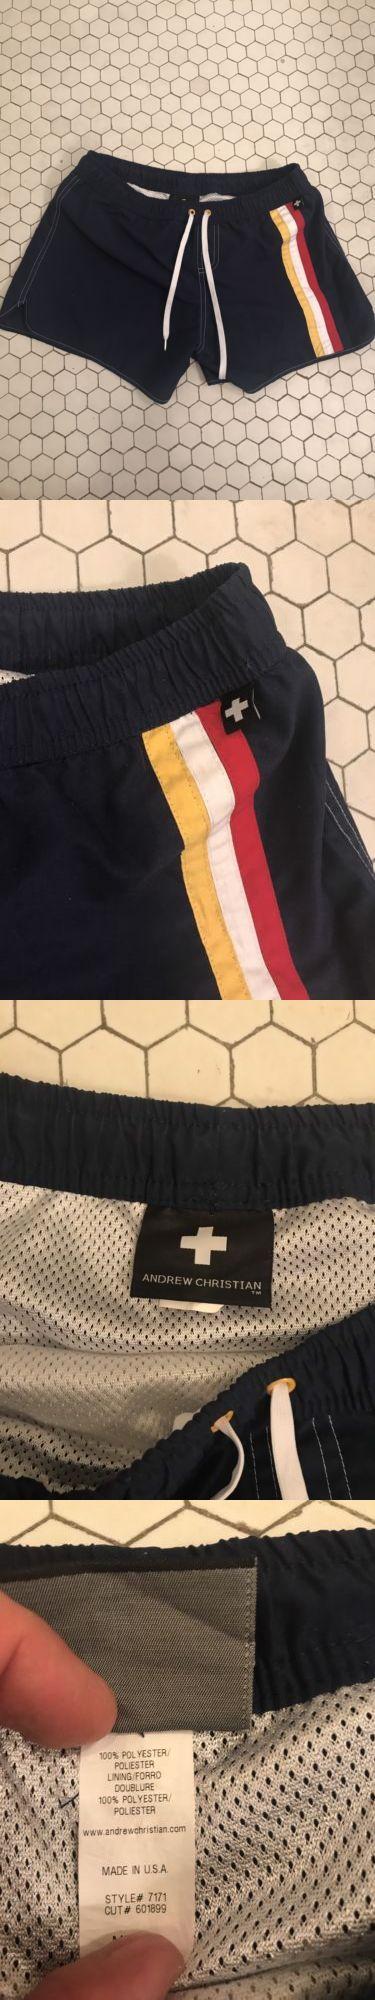 Swimwear 15690: Andrew Christian Men S Swimwear Trunks M Medium Luxury Sport Cruise -> BUY IT NOW ONLY: $36.69 on eBay!